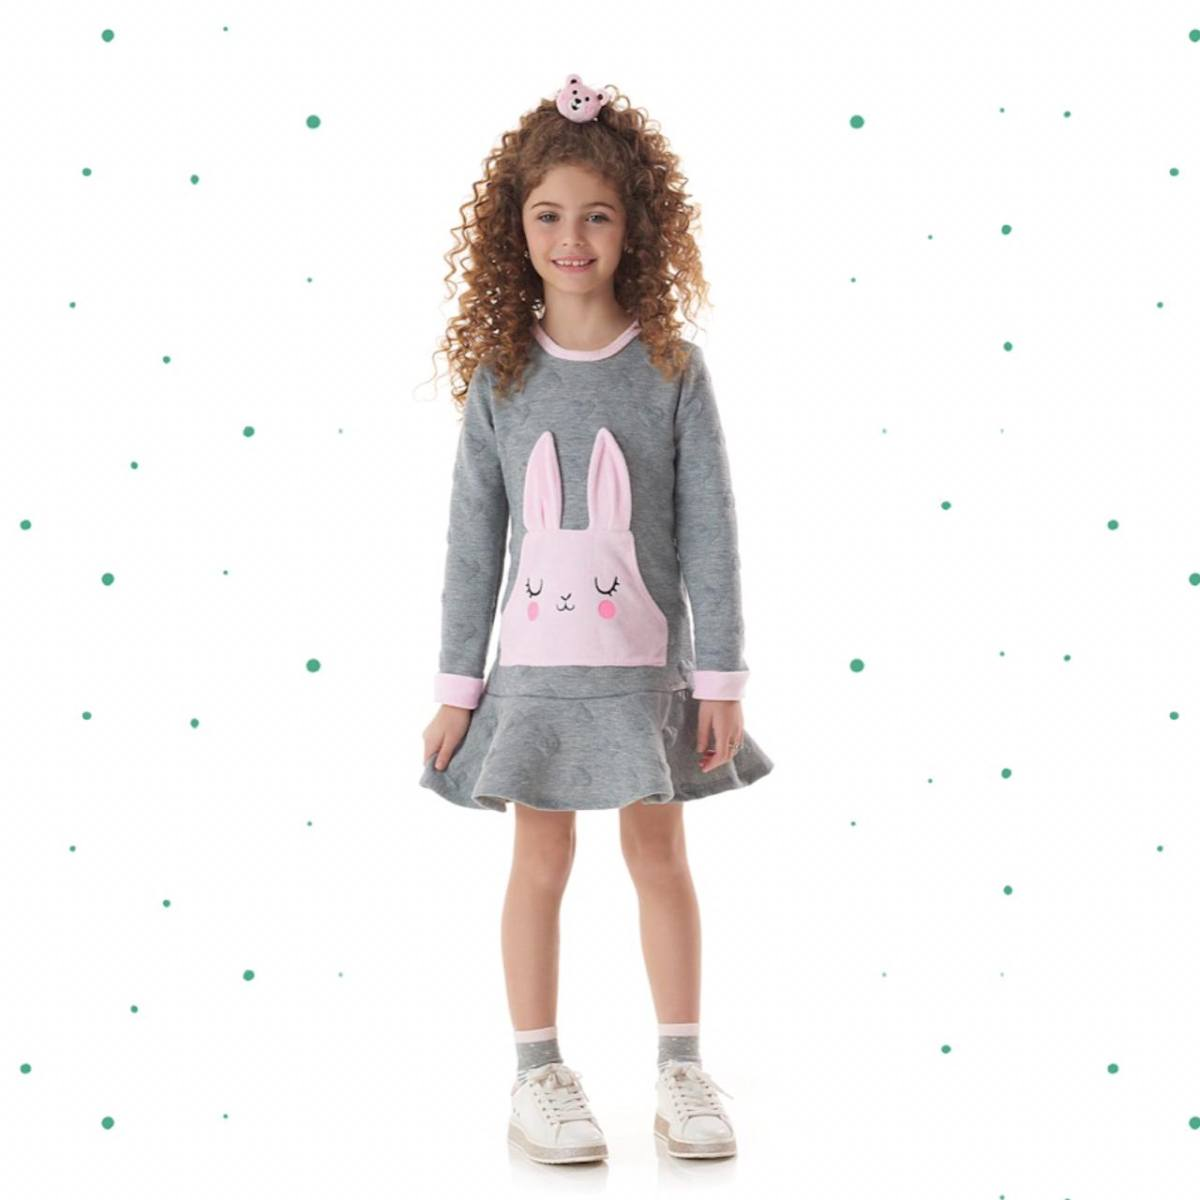 Vestido Infantil Kukiê em Malha Jacquard